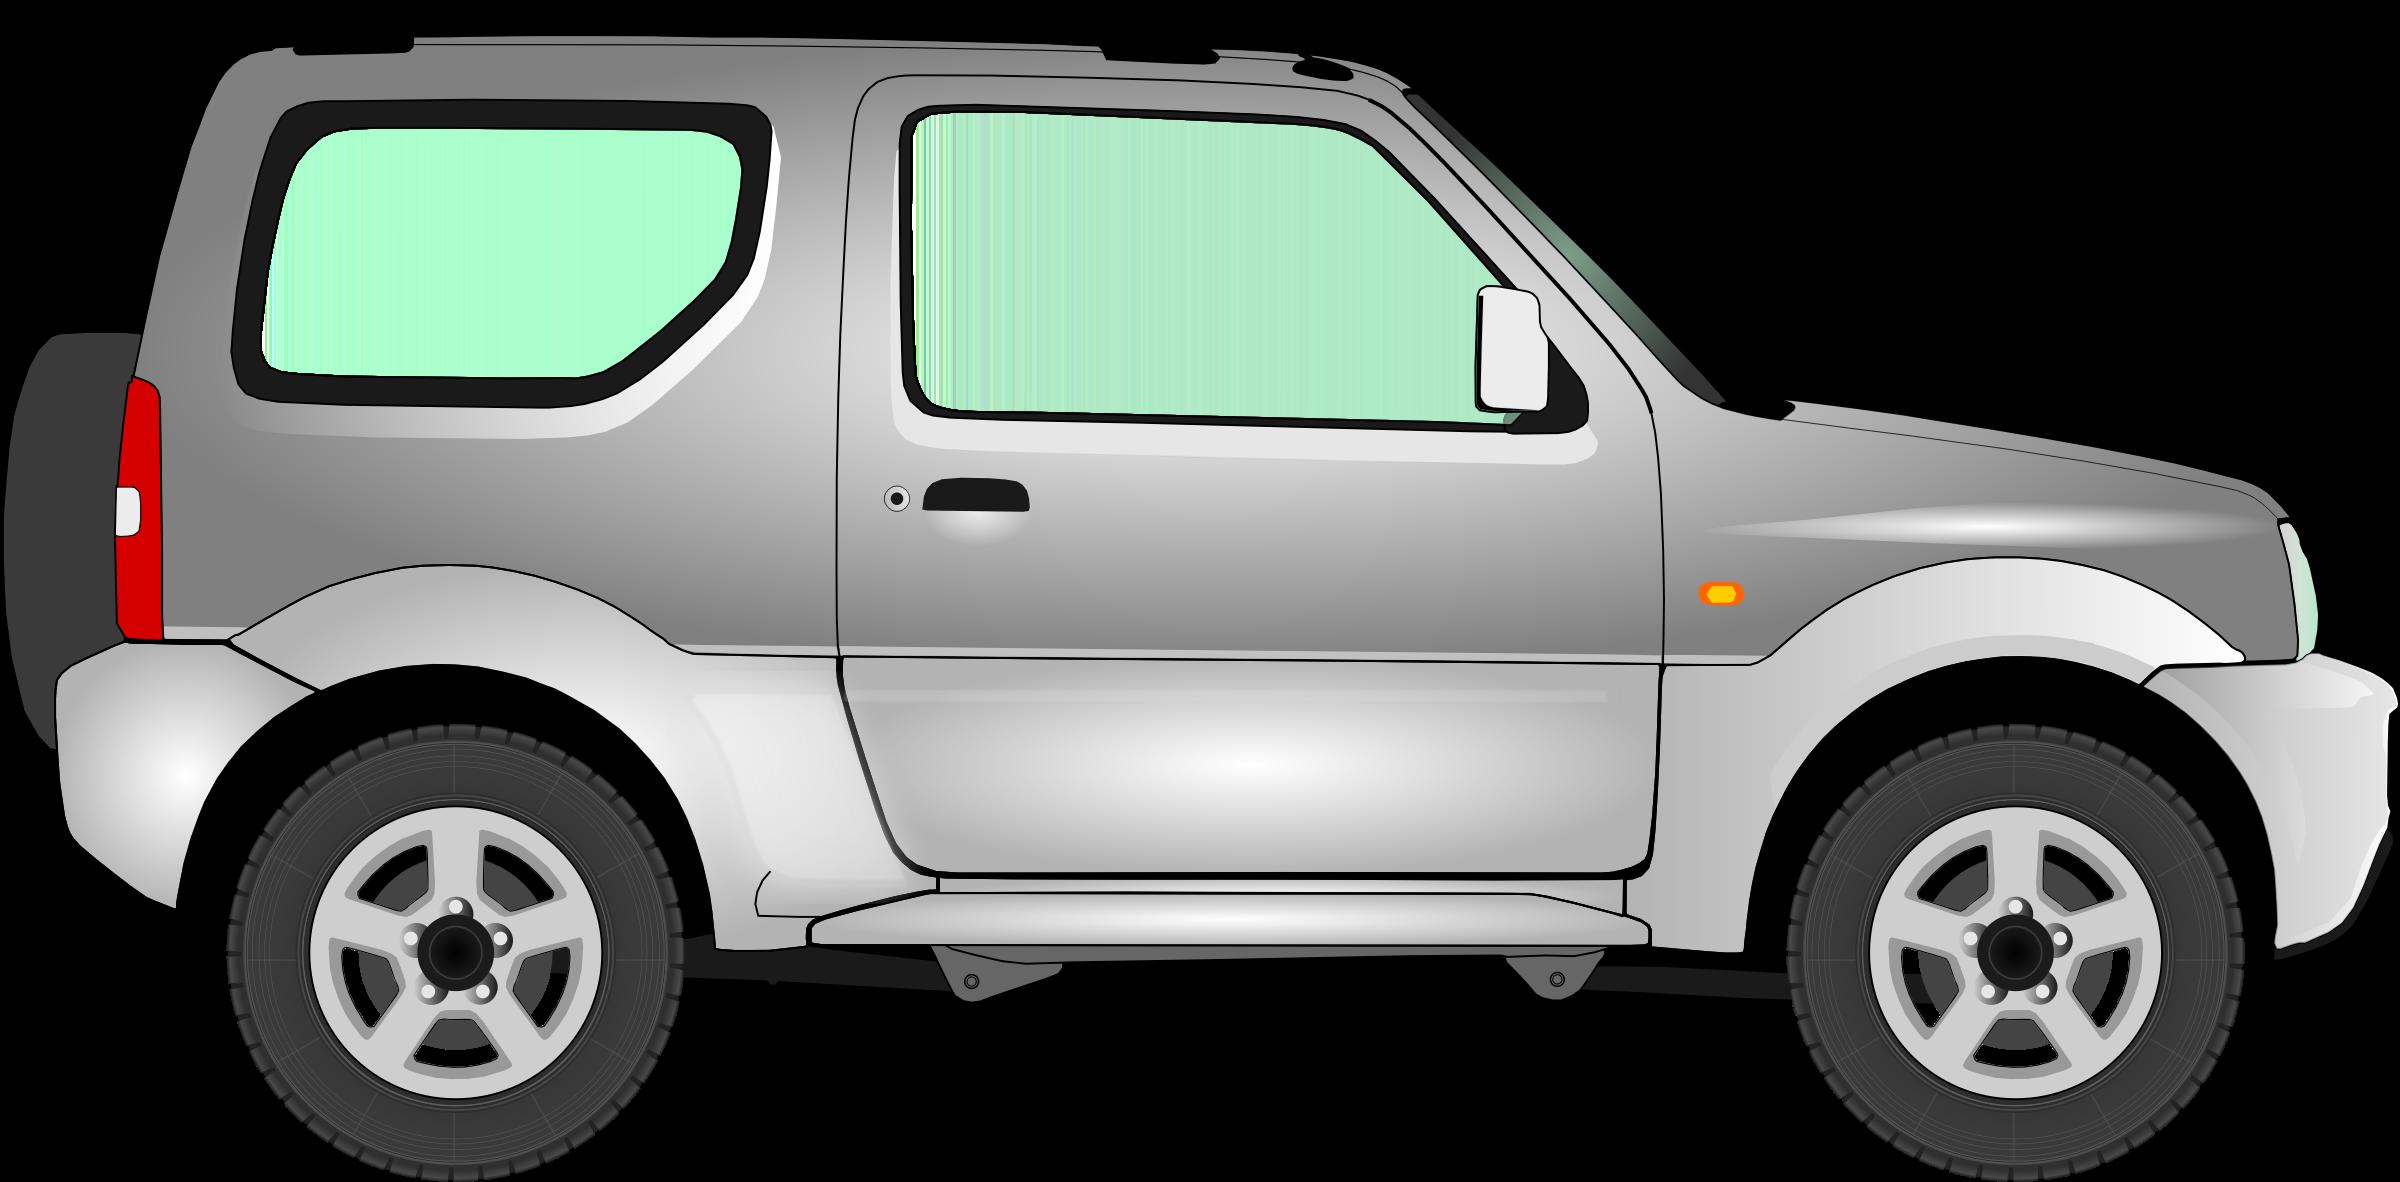 Clipart cars suv. Car silver big image